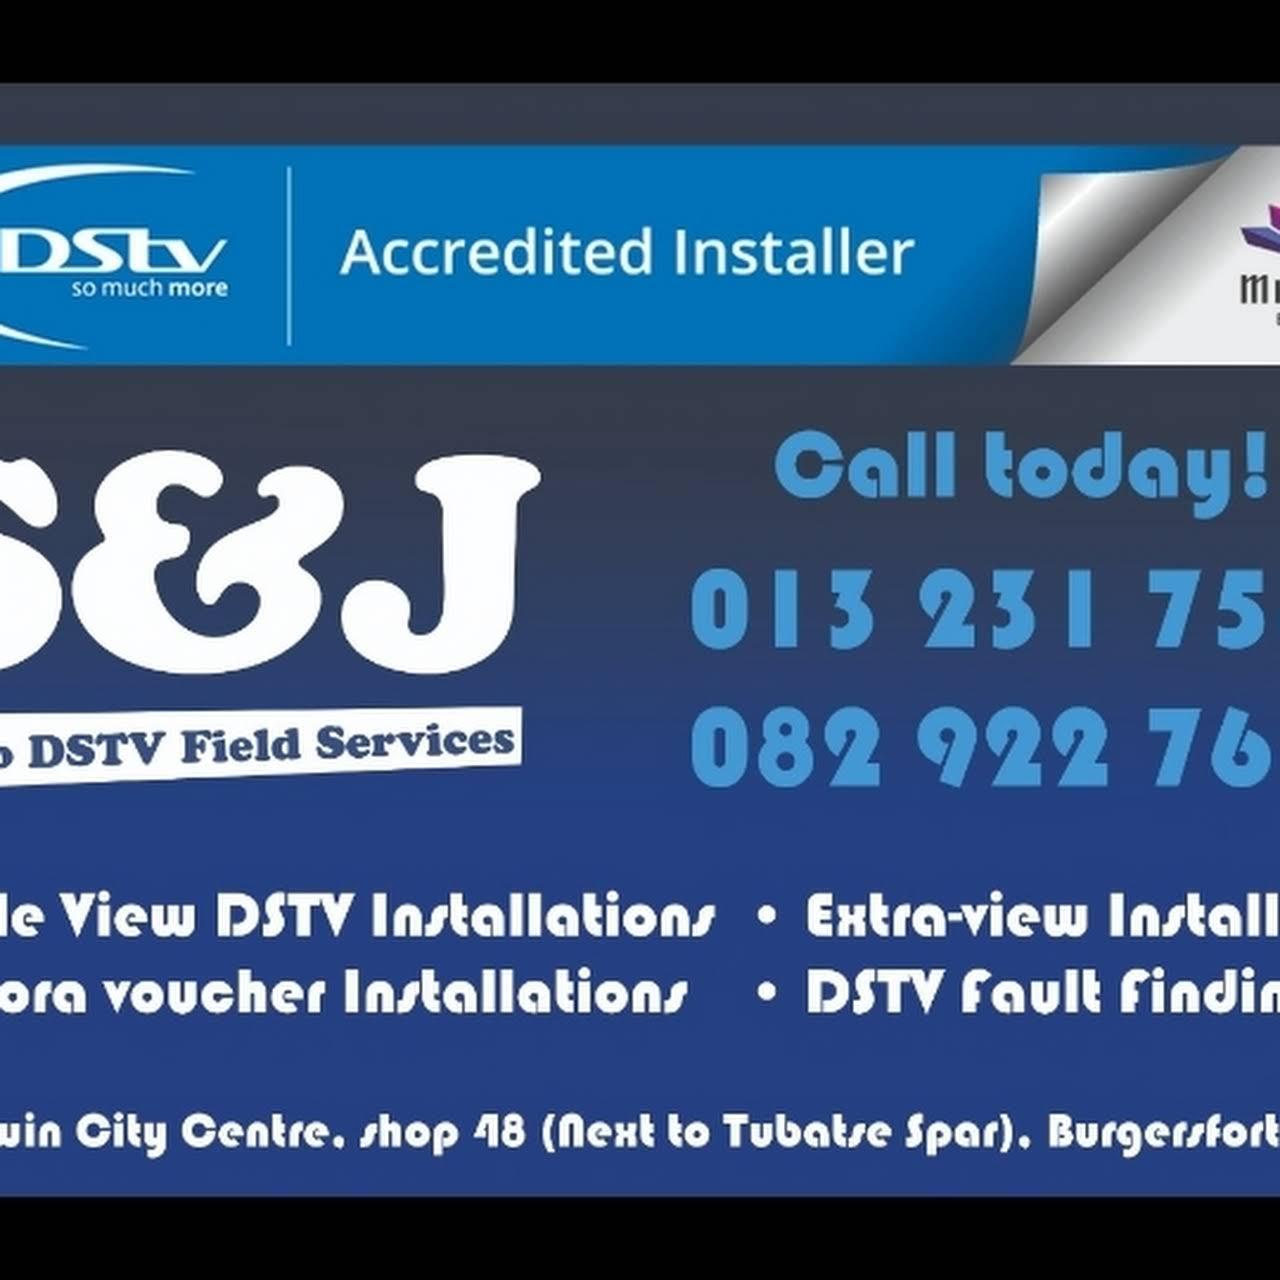 S&J RADIO DSTV BURGERSFORT - DSTV Accredited Installer in